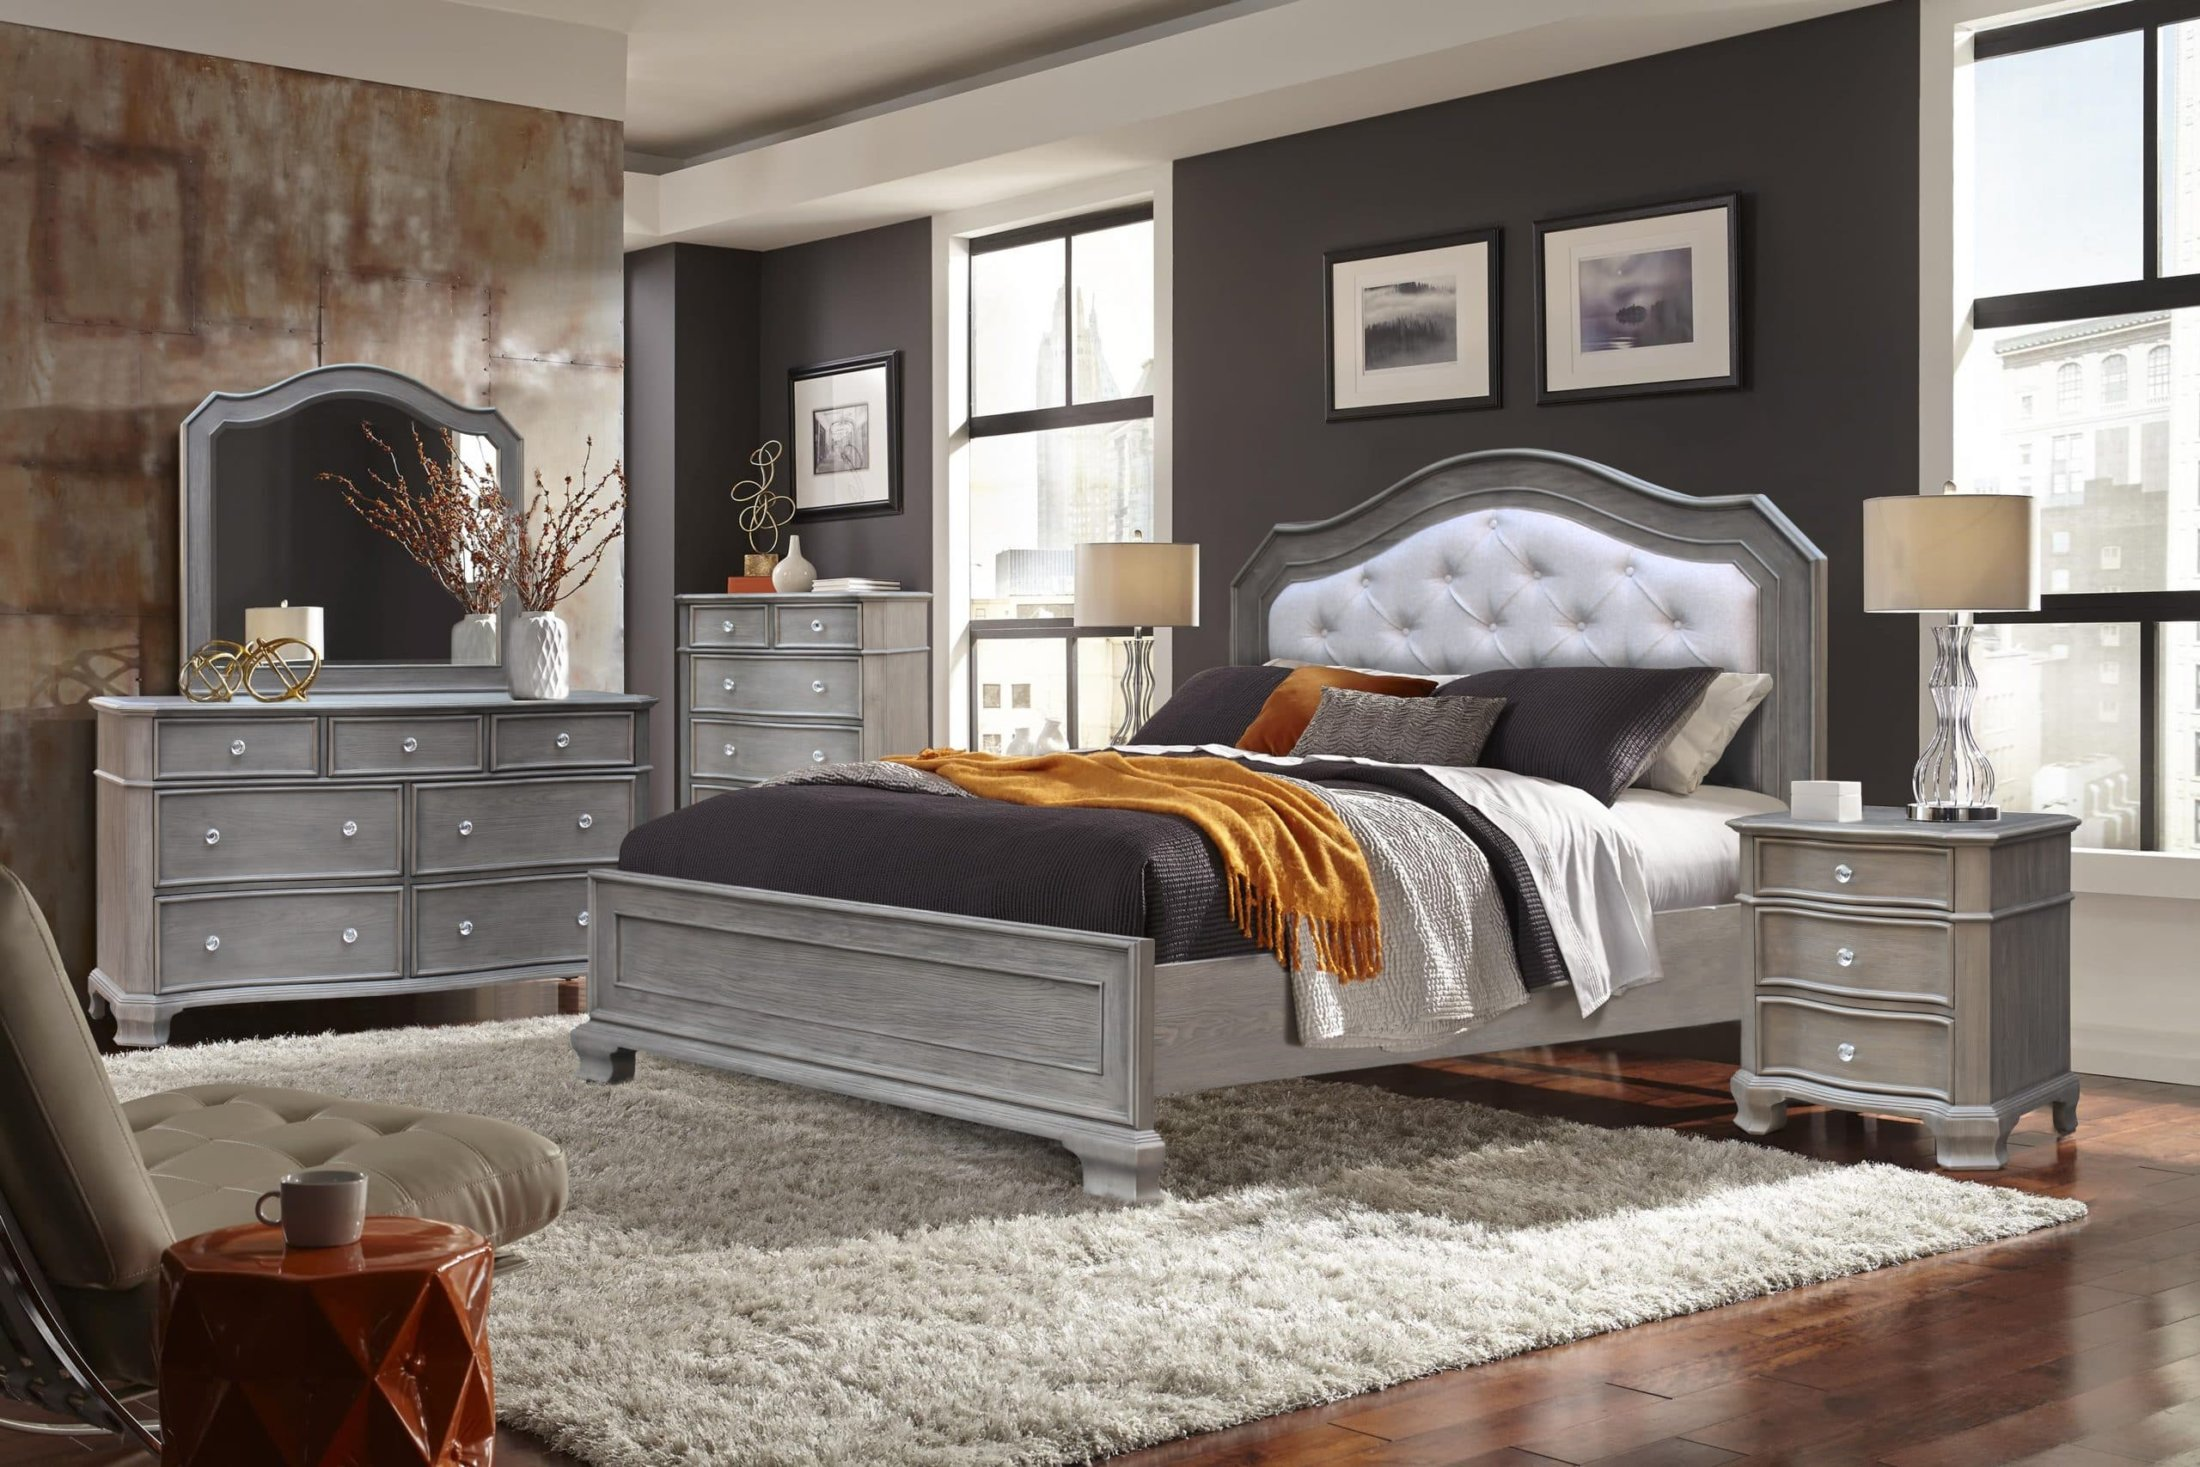 Bedroom-set-04-6613-scaled